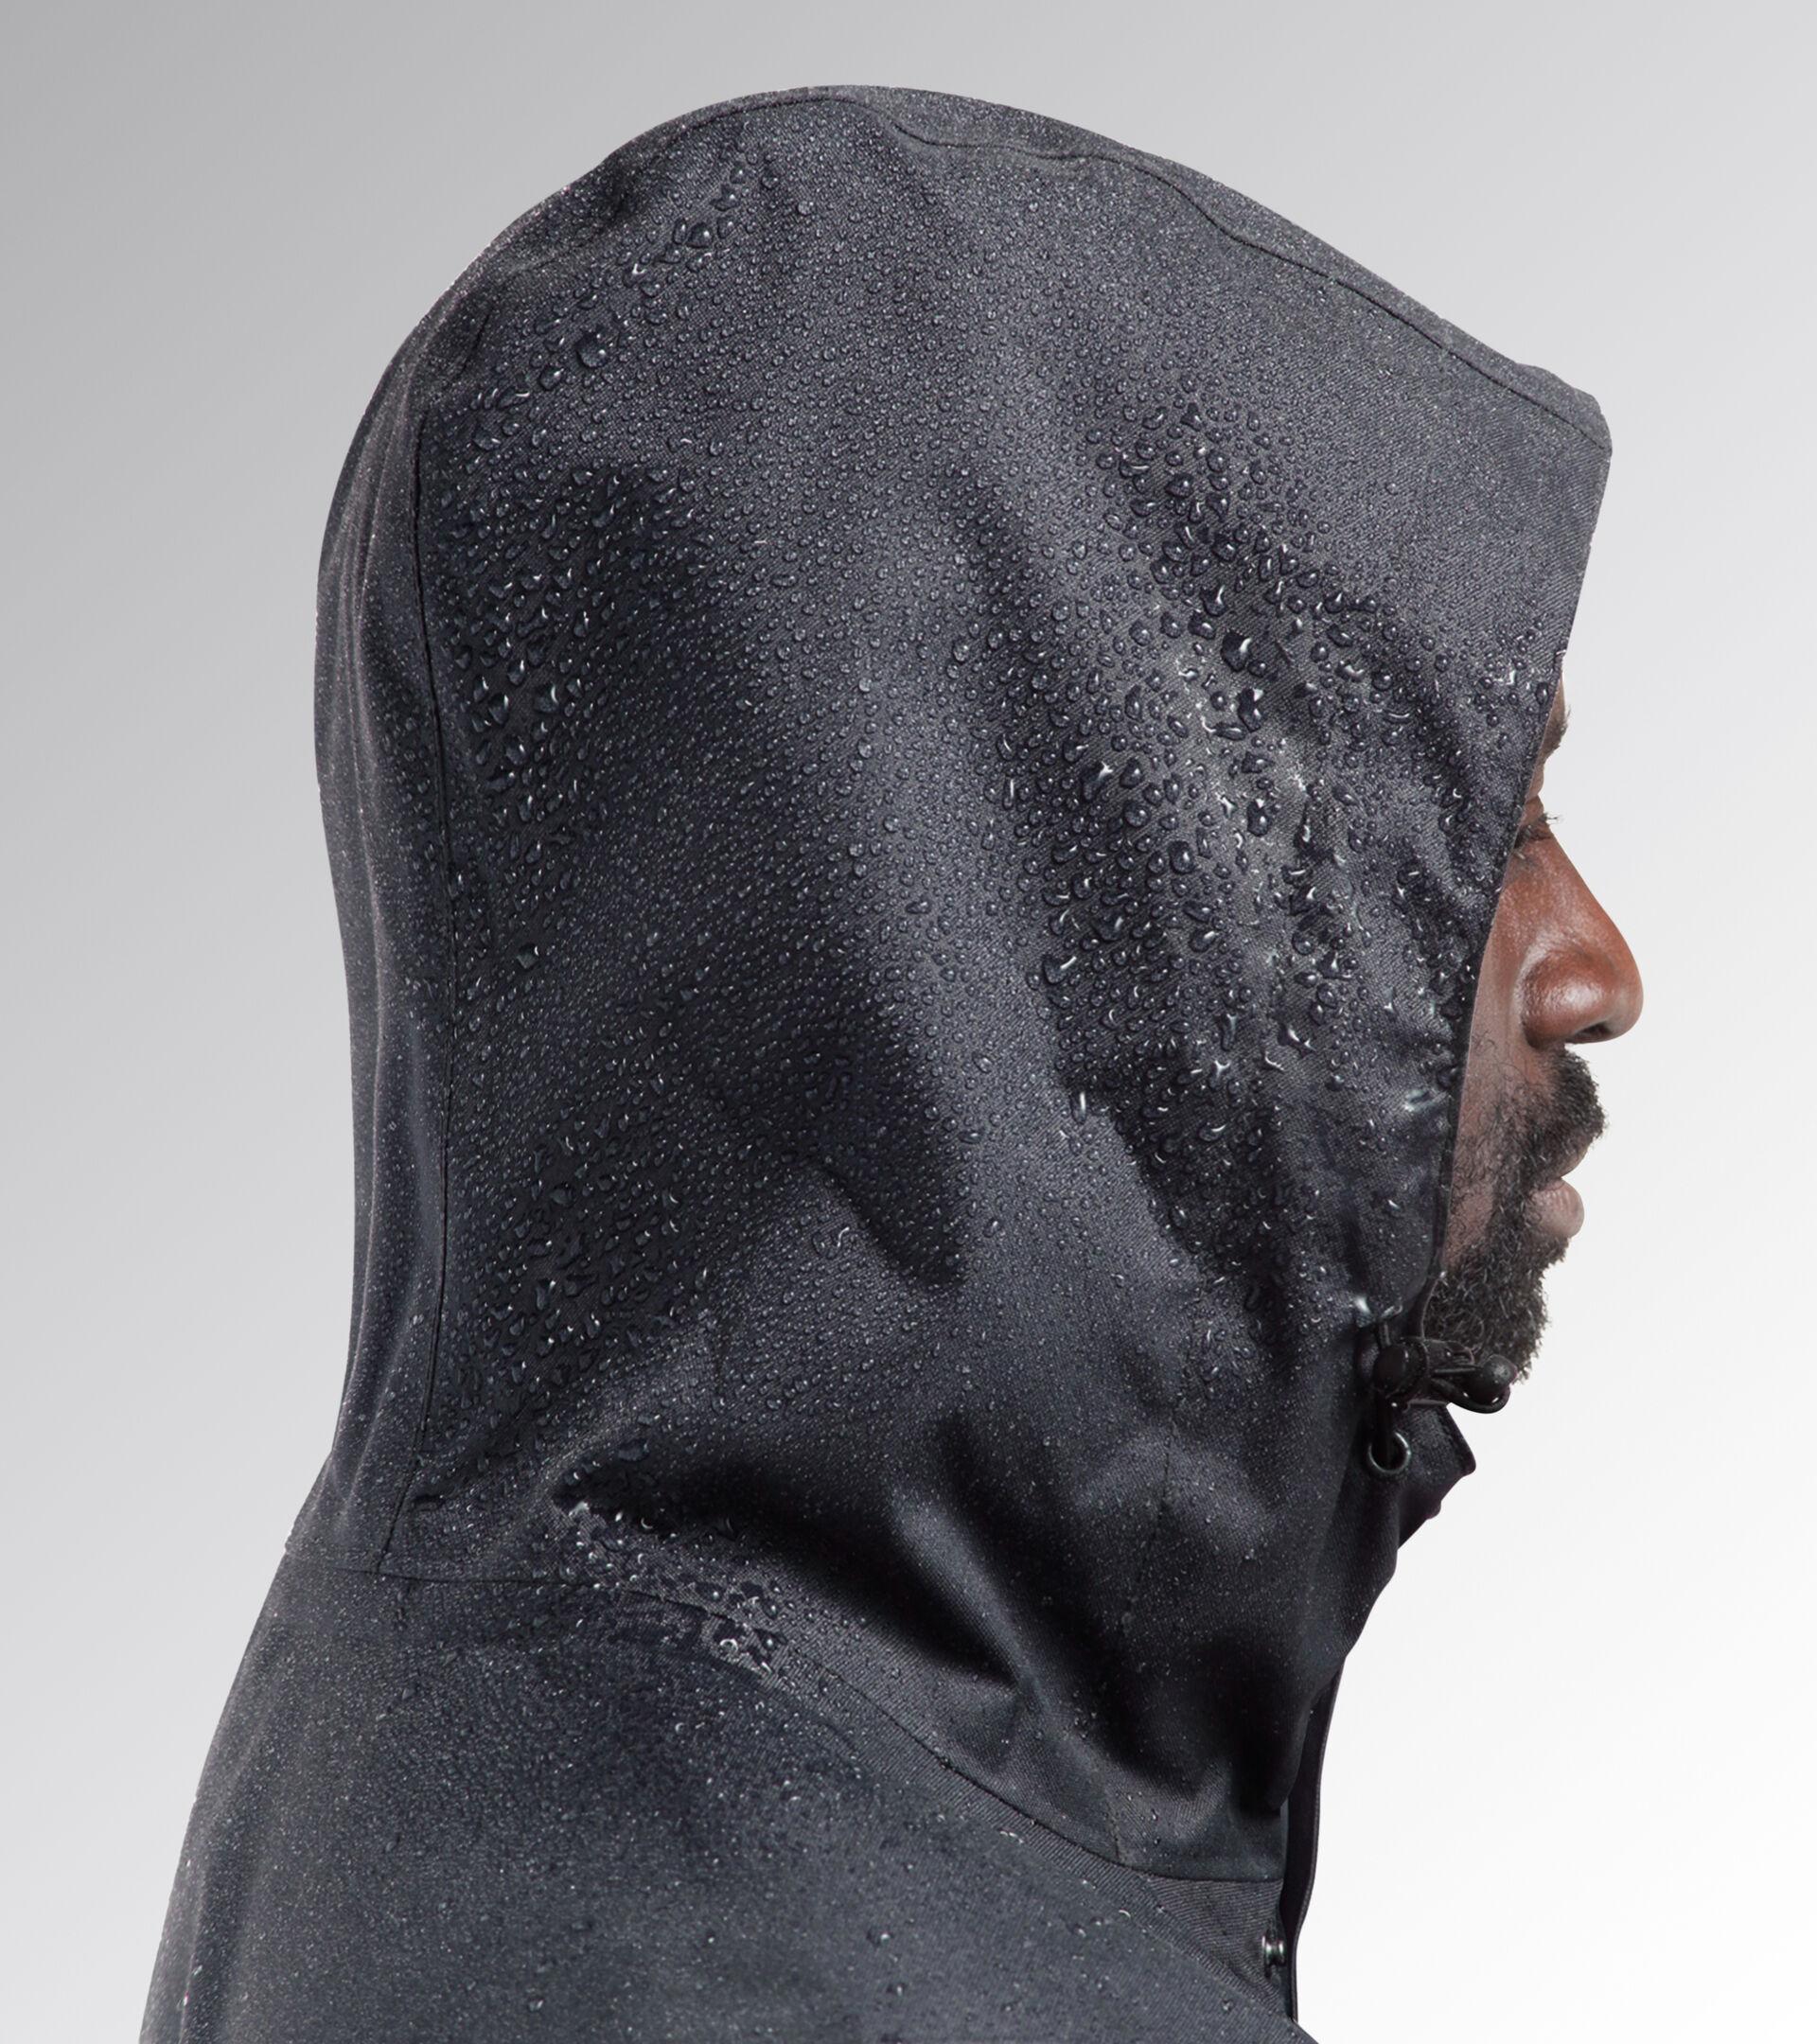 Apparel Utility UOMO RAIN JKT LITEWORK EN 343 BLACK COAL Utility